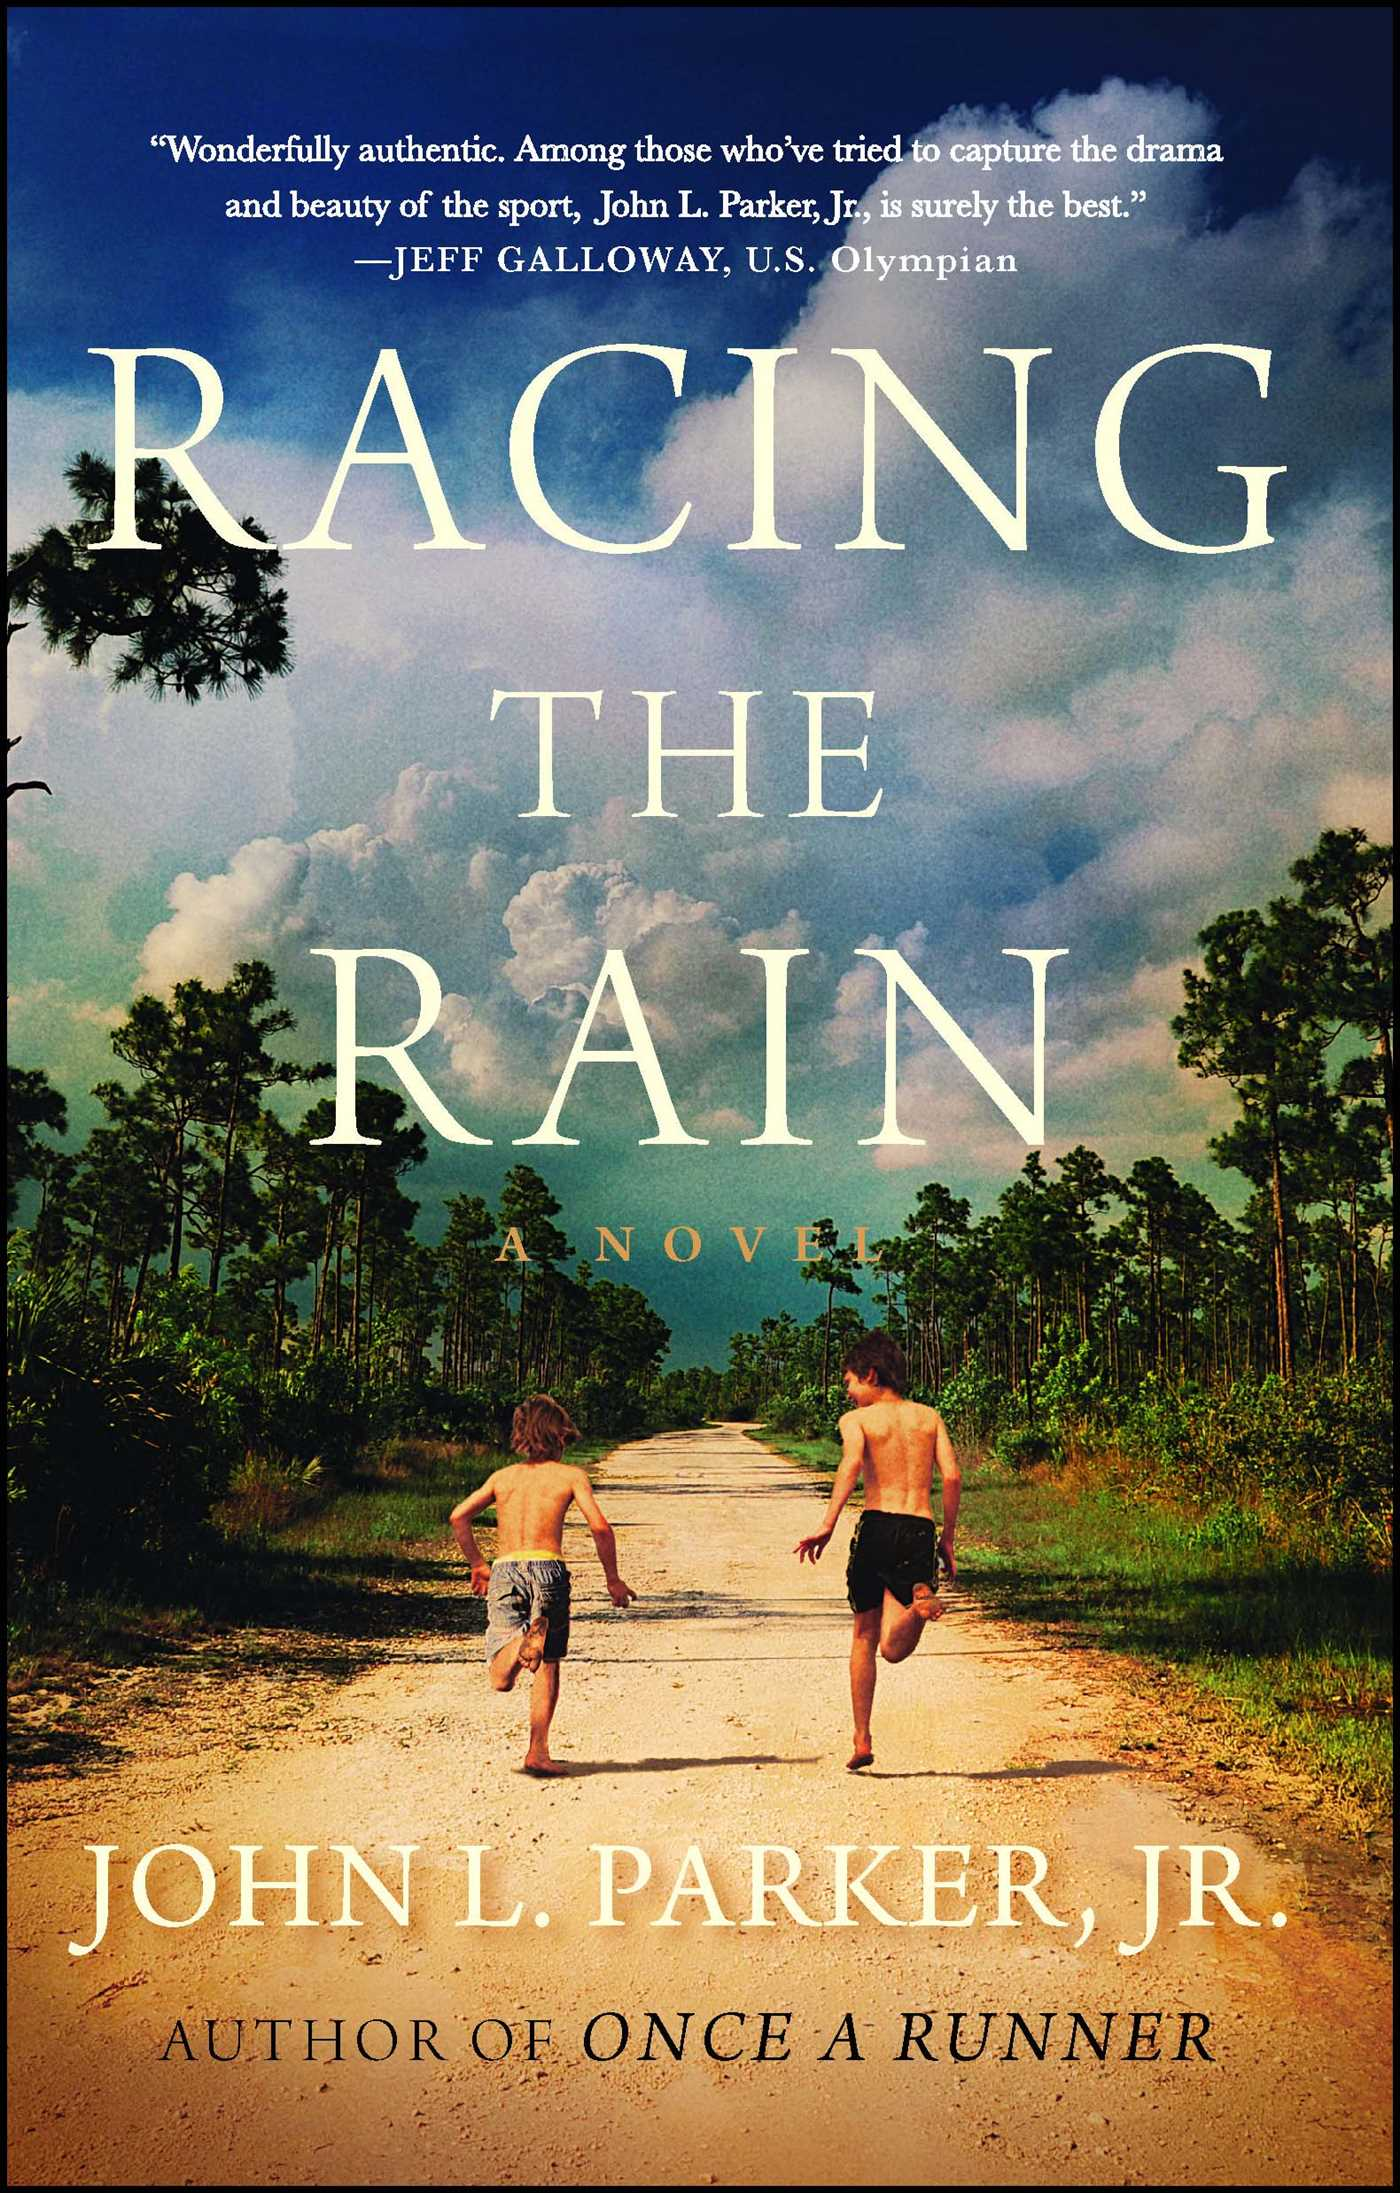 Book Cover Image (jpg): Racing the Rain